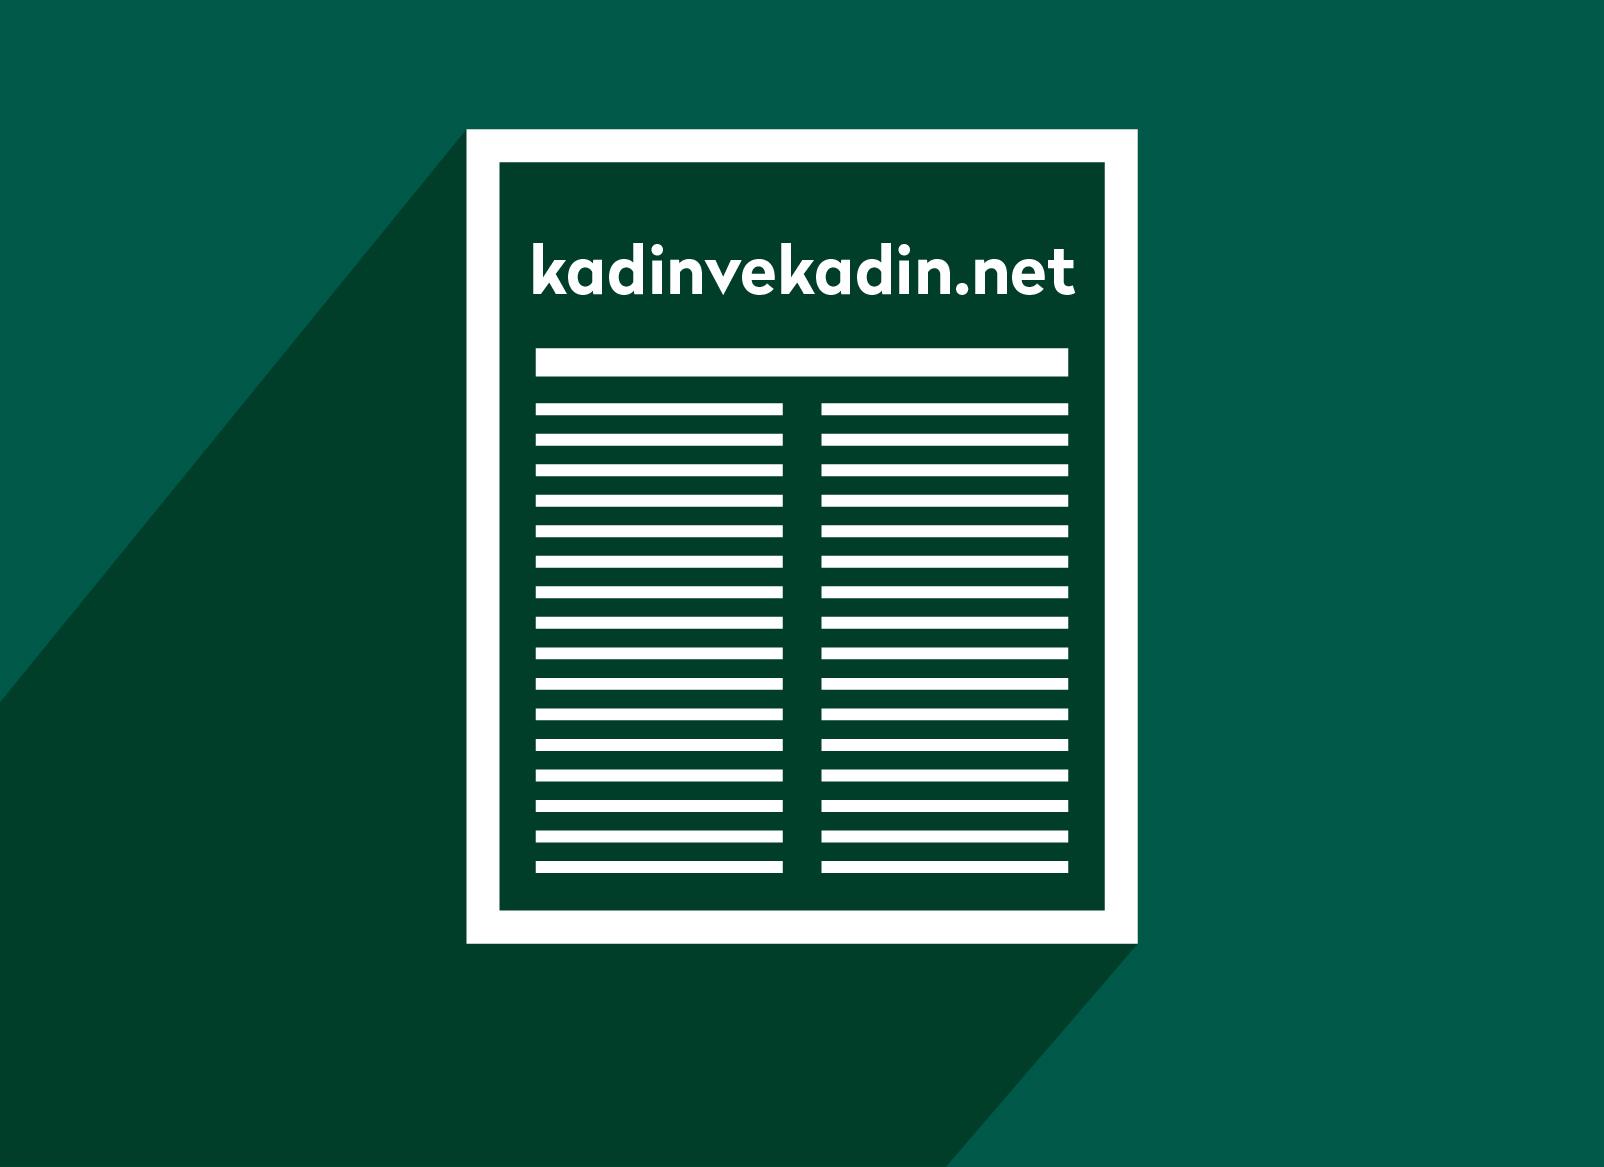 Kadinvekadin.net